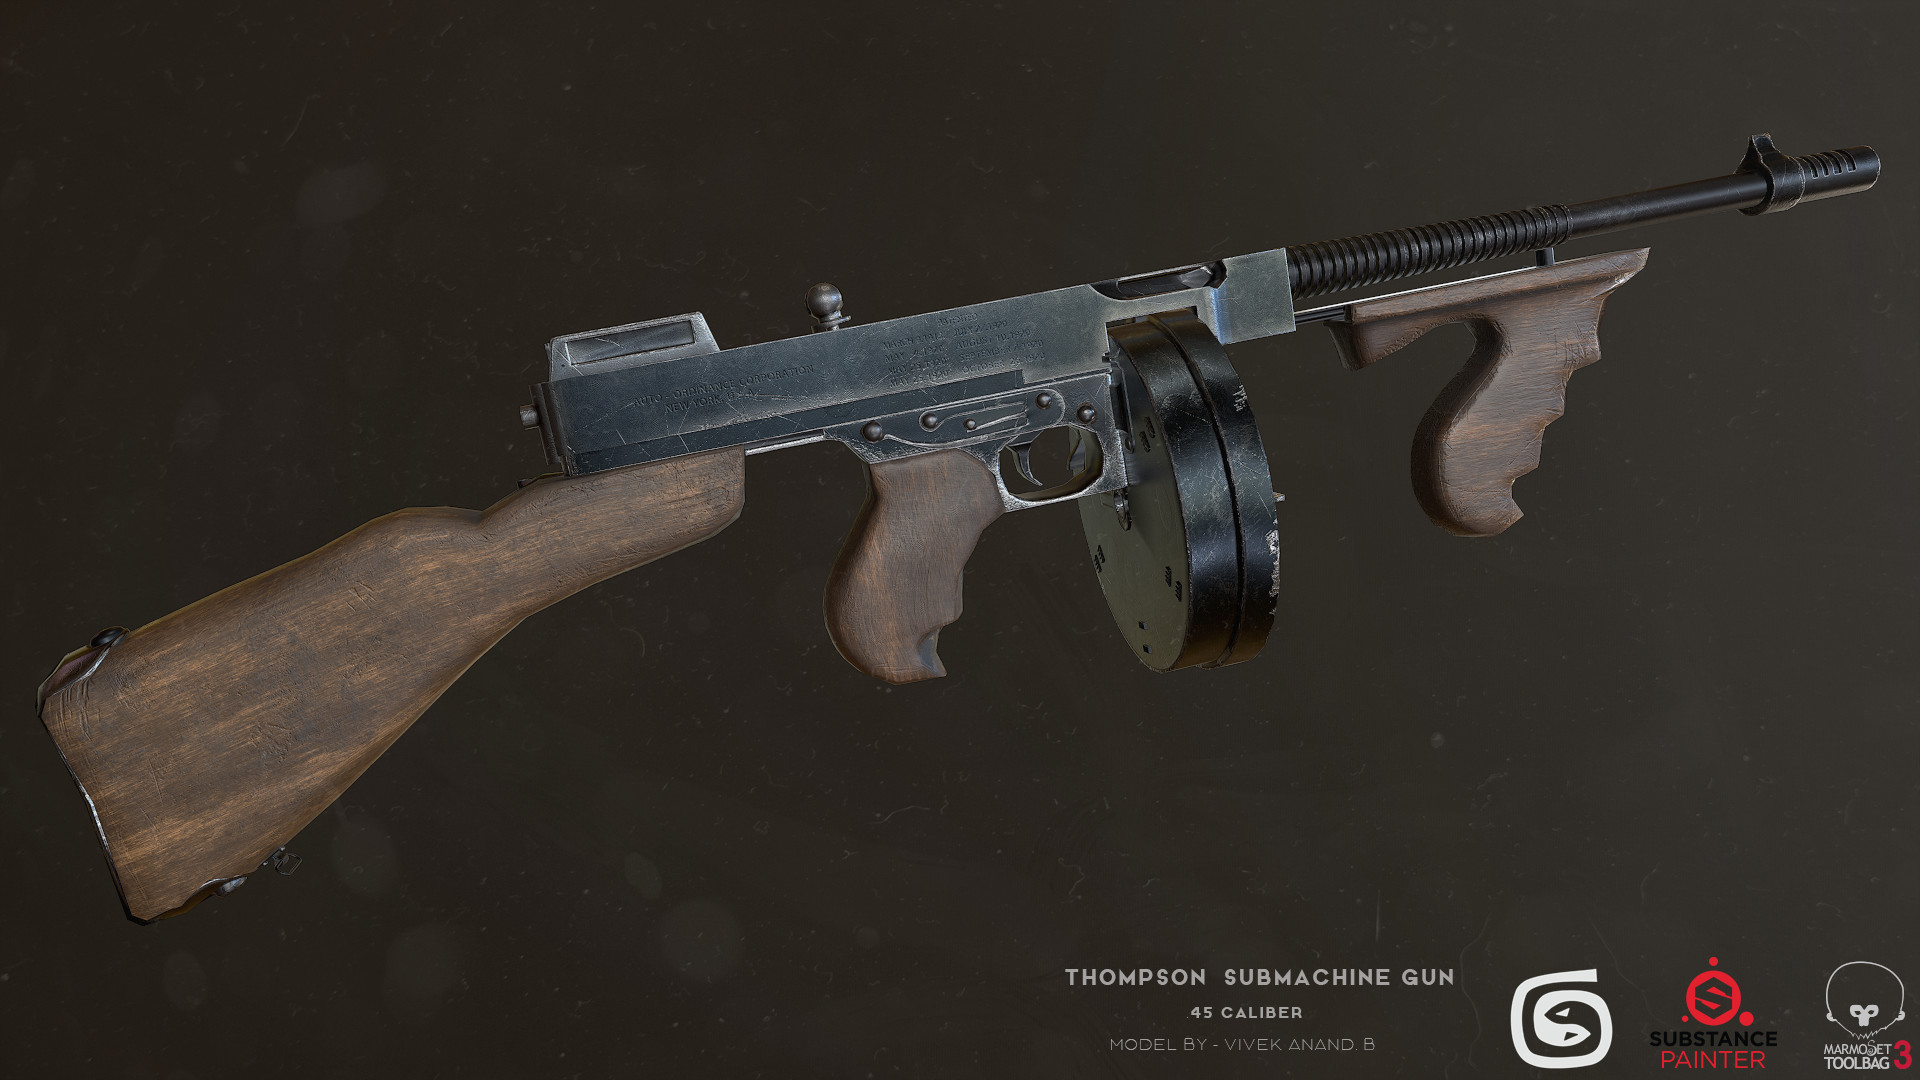 ArtStation - Tommy Gun, Vivek Anand